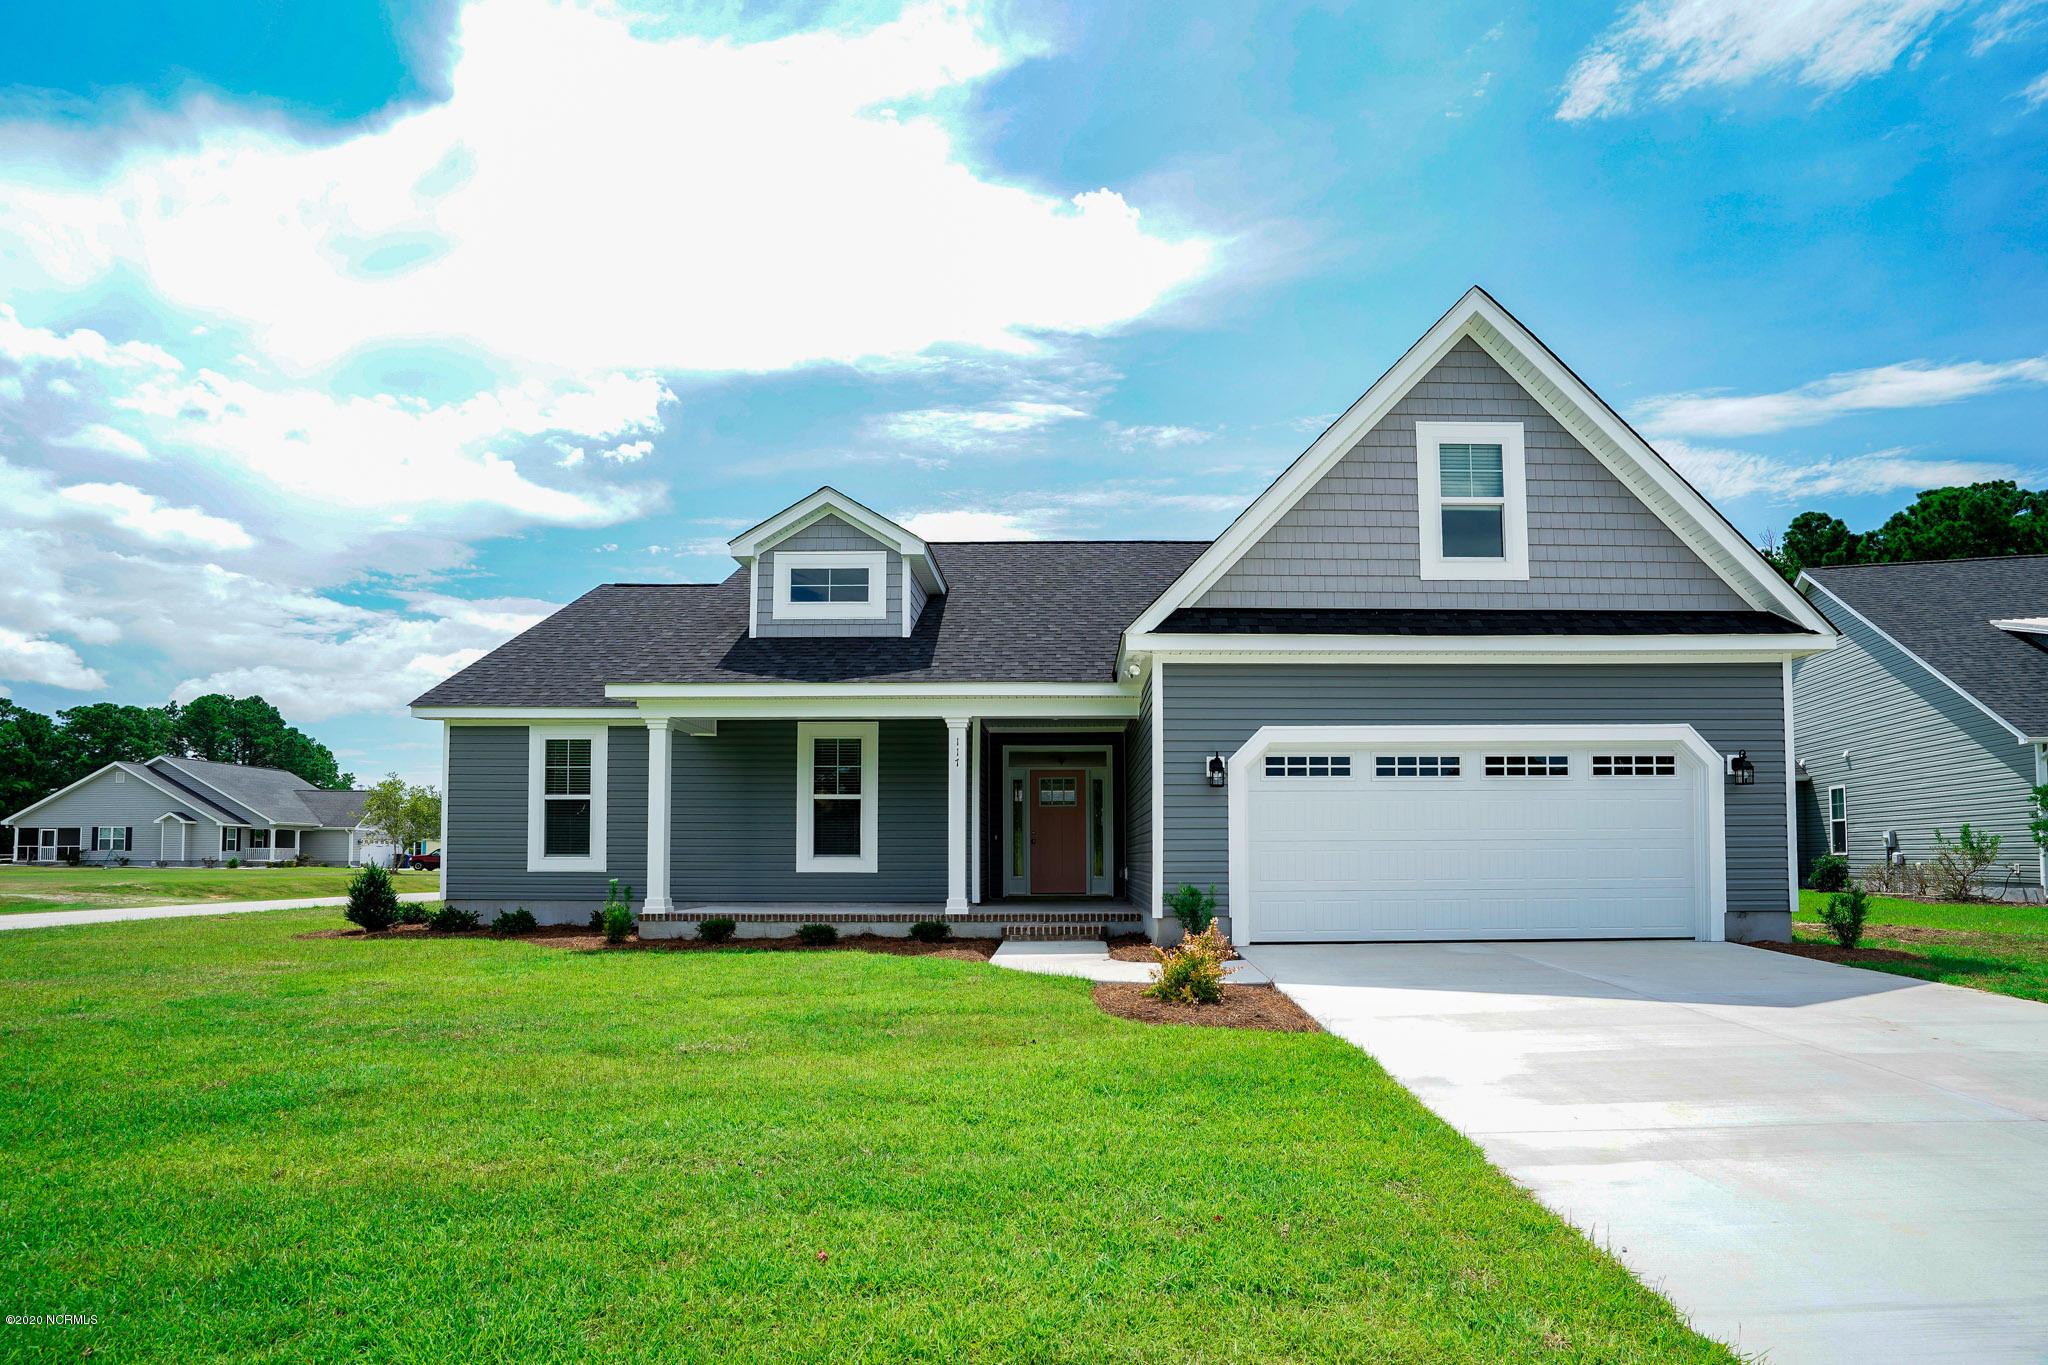 117 Holland Farm Rd., Cedar Point, North Carolina 28584, 3 Bedrooms Bedrooms, ,2 BathroomsBathrooms,Residential,For Sale,Holland Farm Rd.,100196243